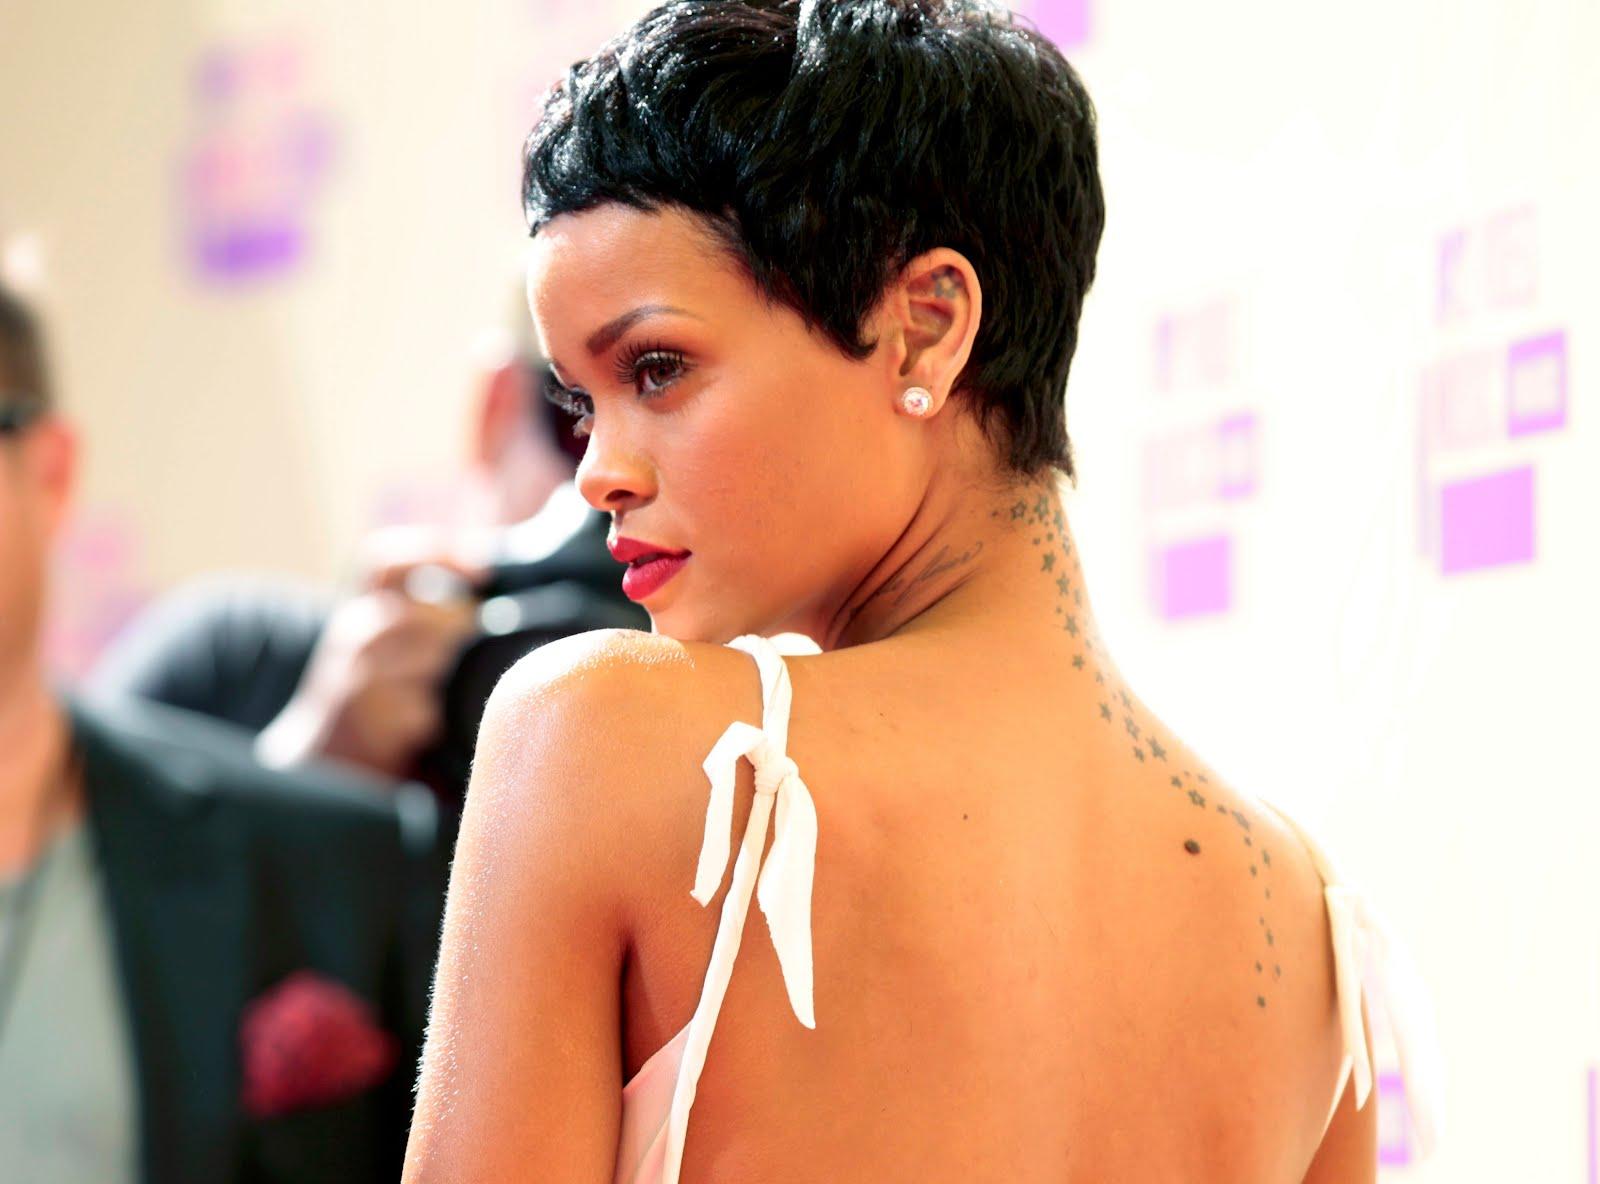 http://4.bp.blogspot.com/-tTIviksOOns/UElOnGFkfEI/AAAAAAAAMq8/4YrbyBYosSk/s1600/Rihanna-en-MTV-Video-Music-Awards-2012-4.JPG